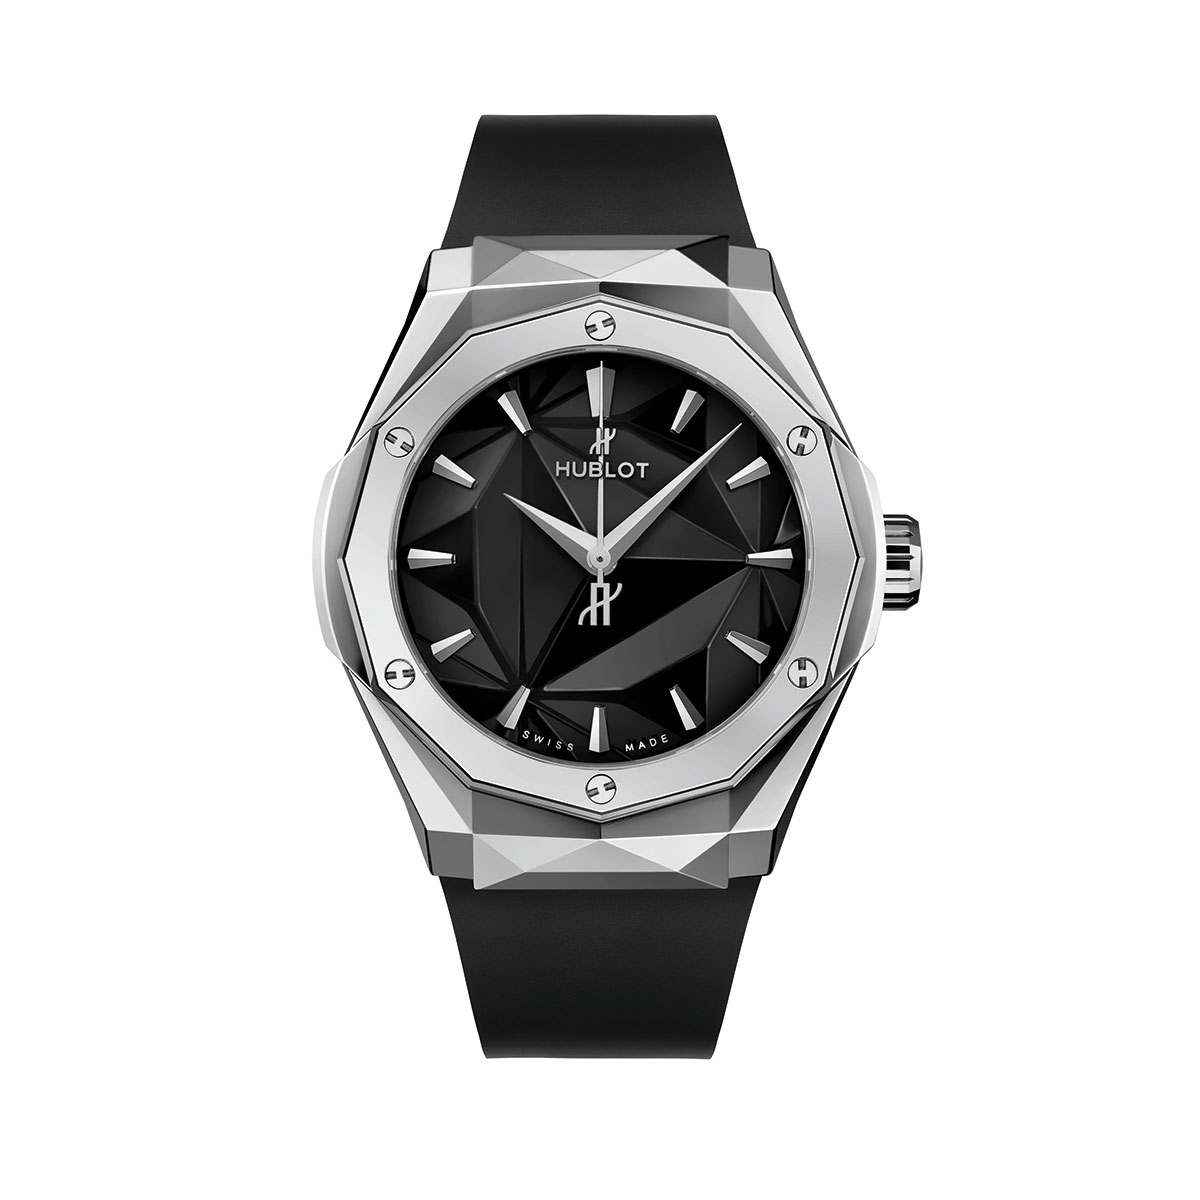 Hublot Classic Fusion Orlinski Titanium 40mm Watch